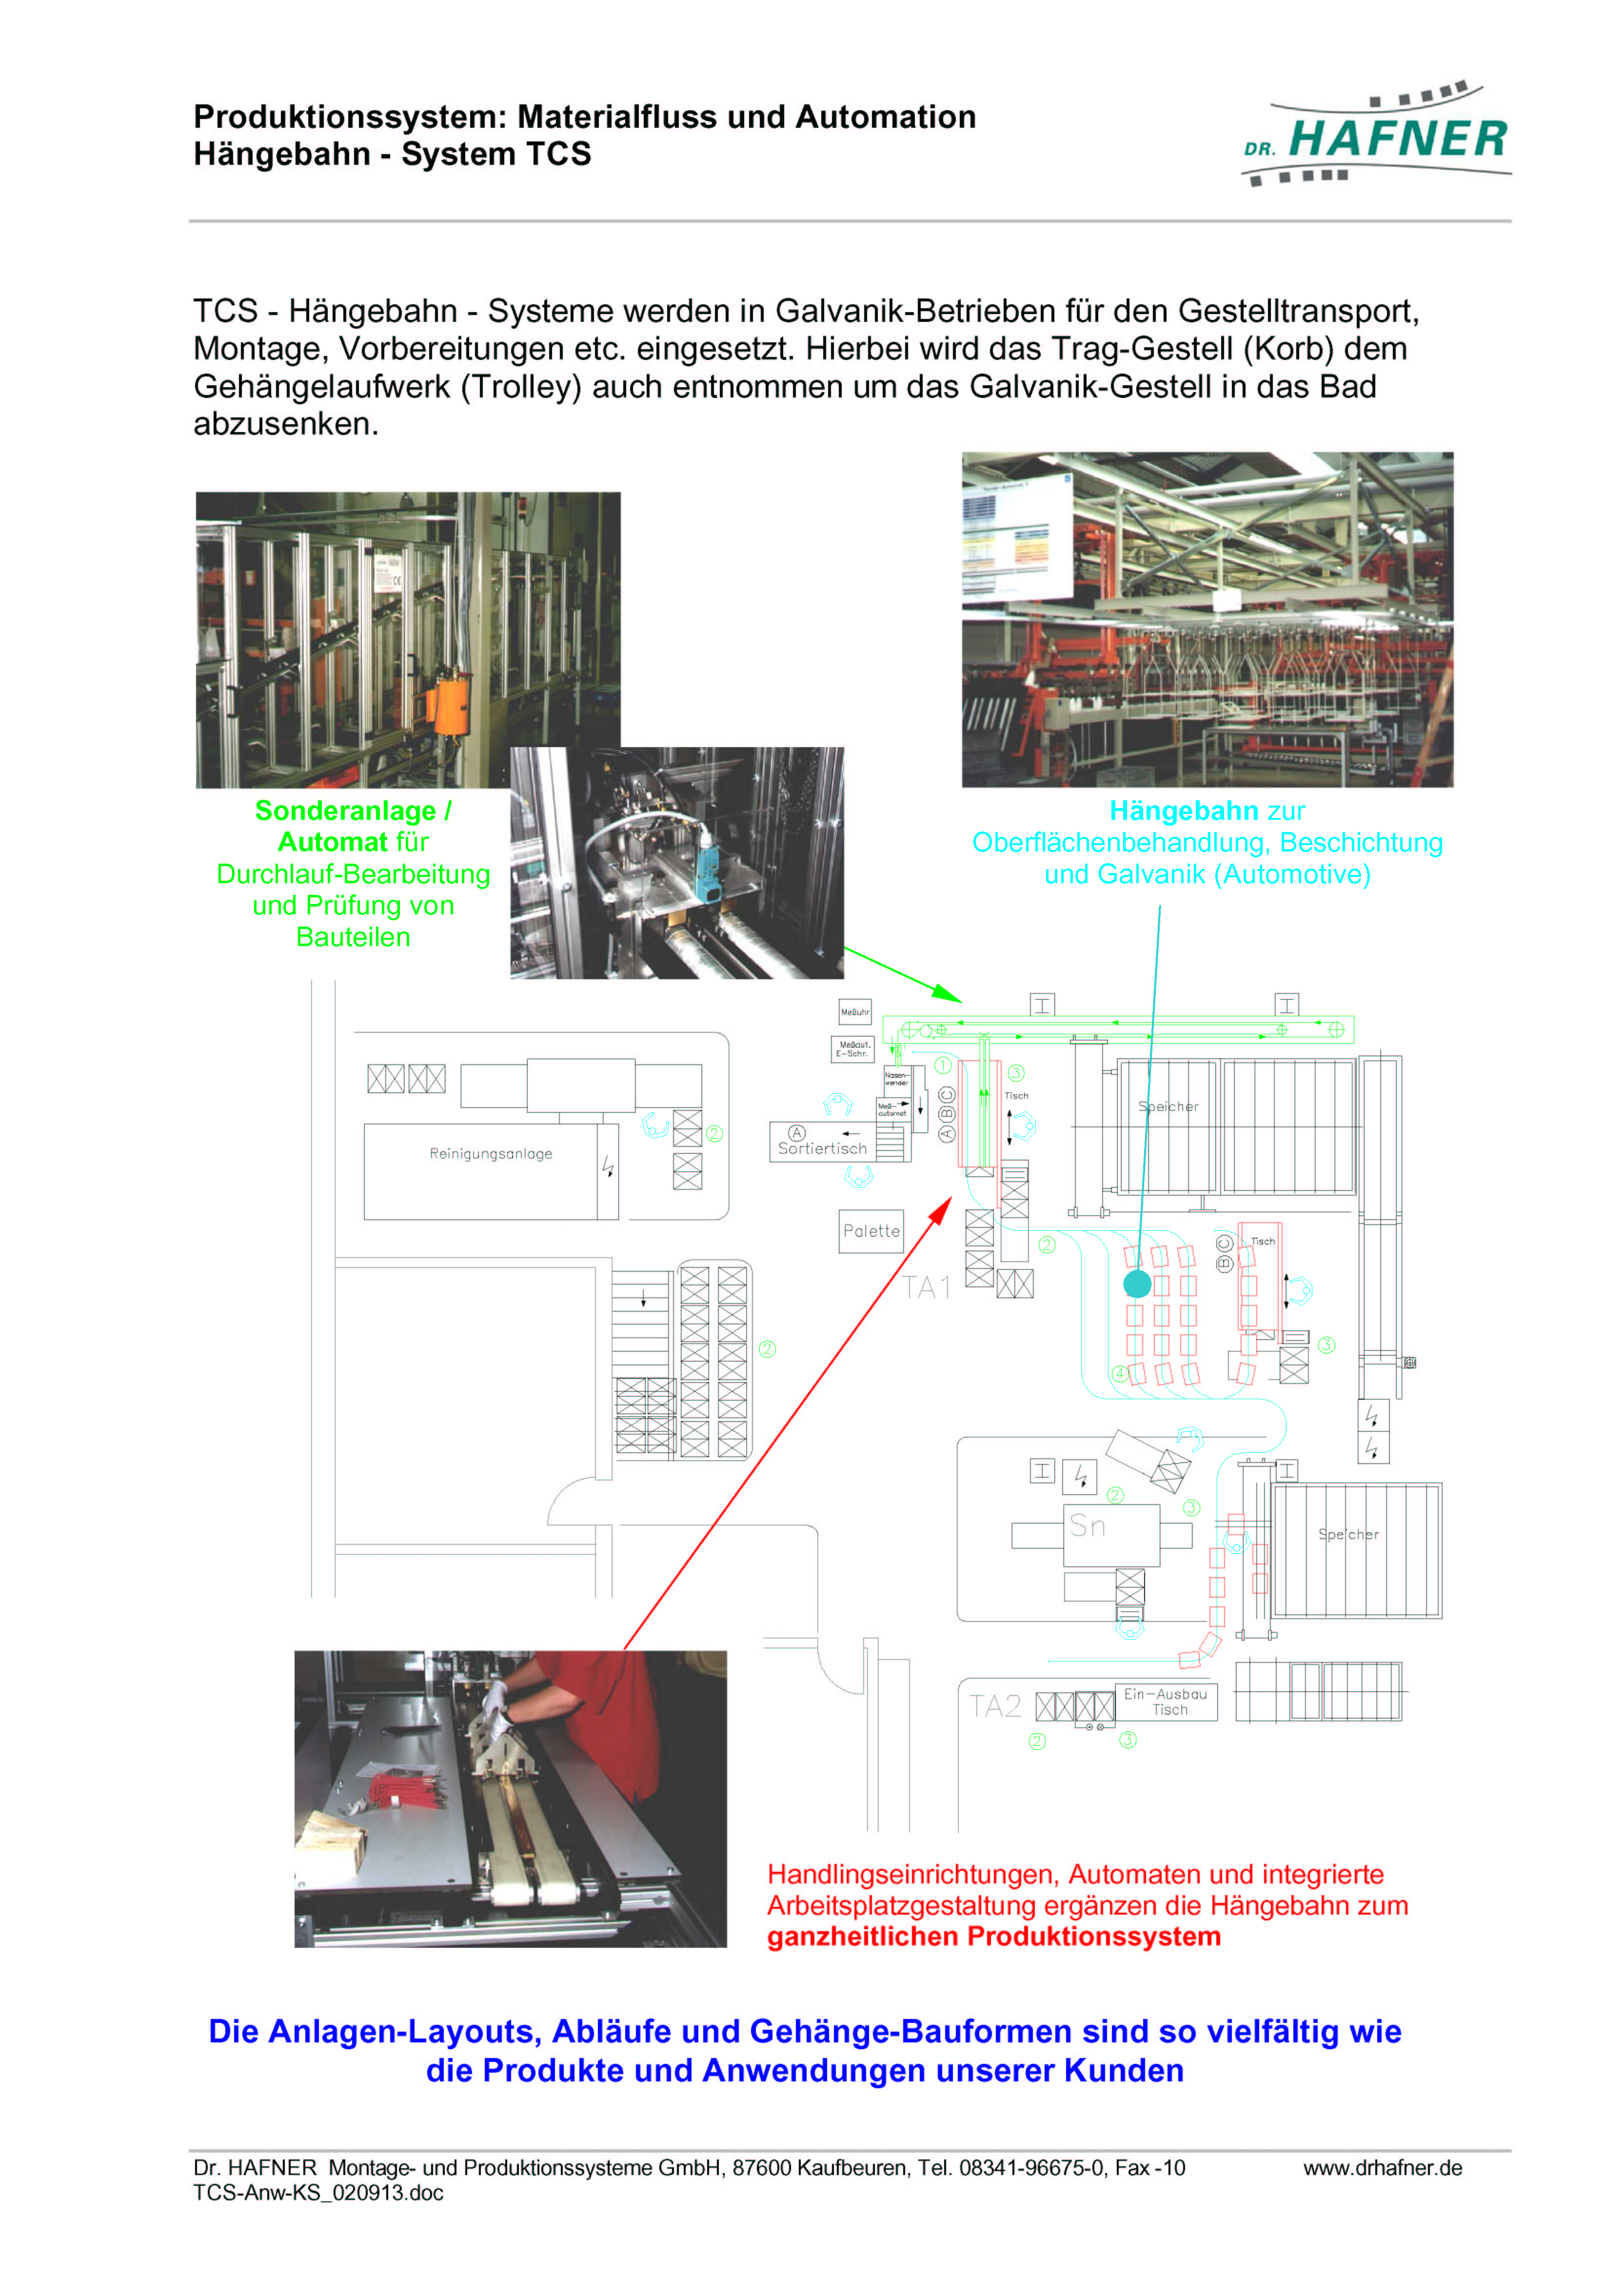 Dr. HAFNER_PKWP_42 Produktionssystem Materialfluss Automation Hängebahn